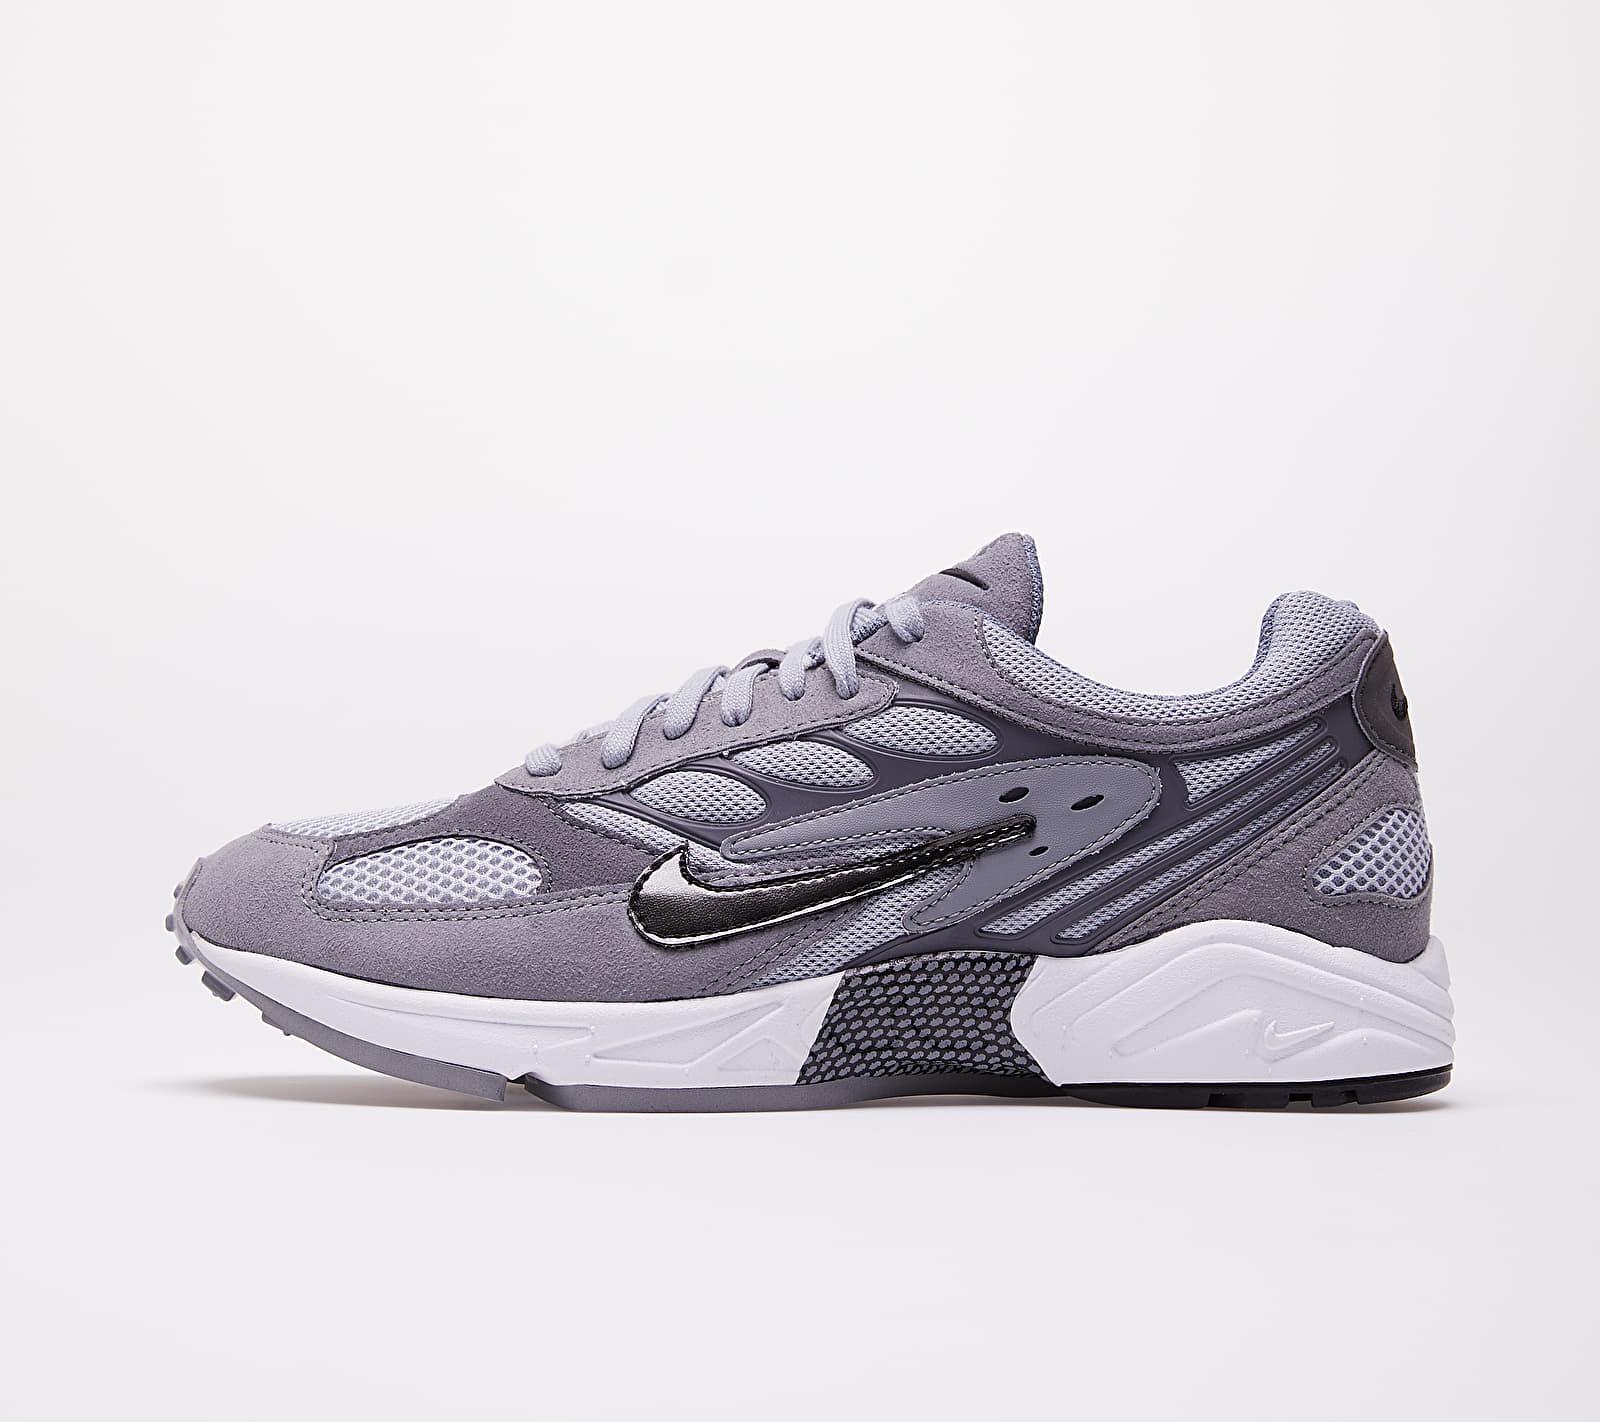 Nike Air Ghost Racer Cool Grey/ Black-Wolf Grey-Dark Grey AT5410-003